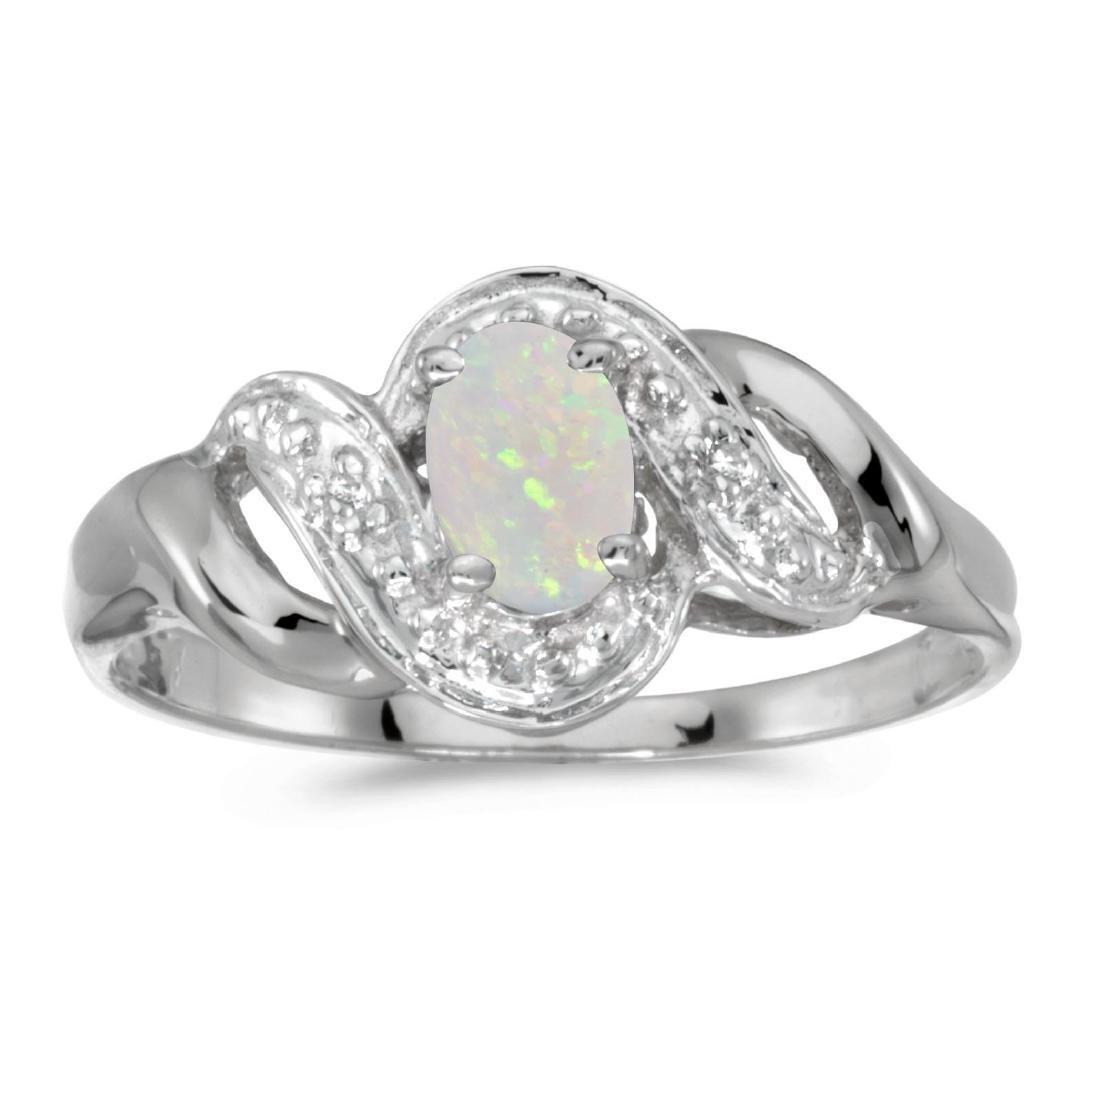 Certified 14k White Gold Oval Opal And Diamond Swirl Ri